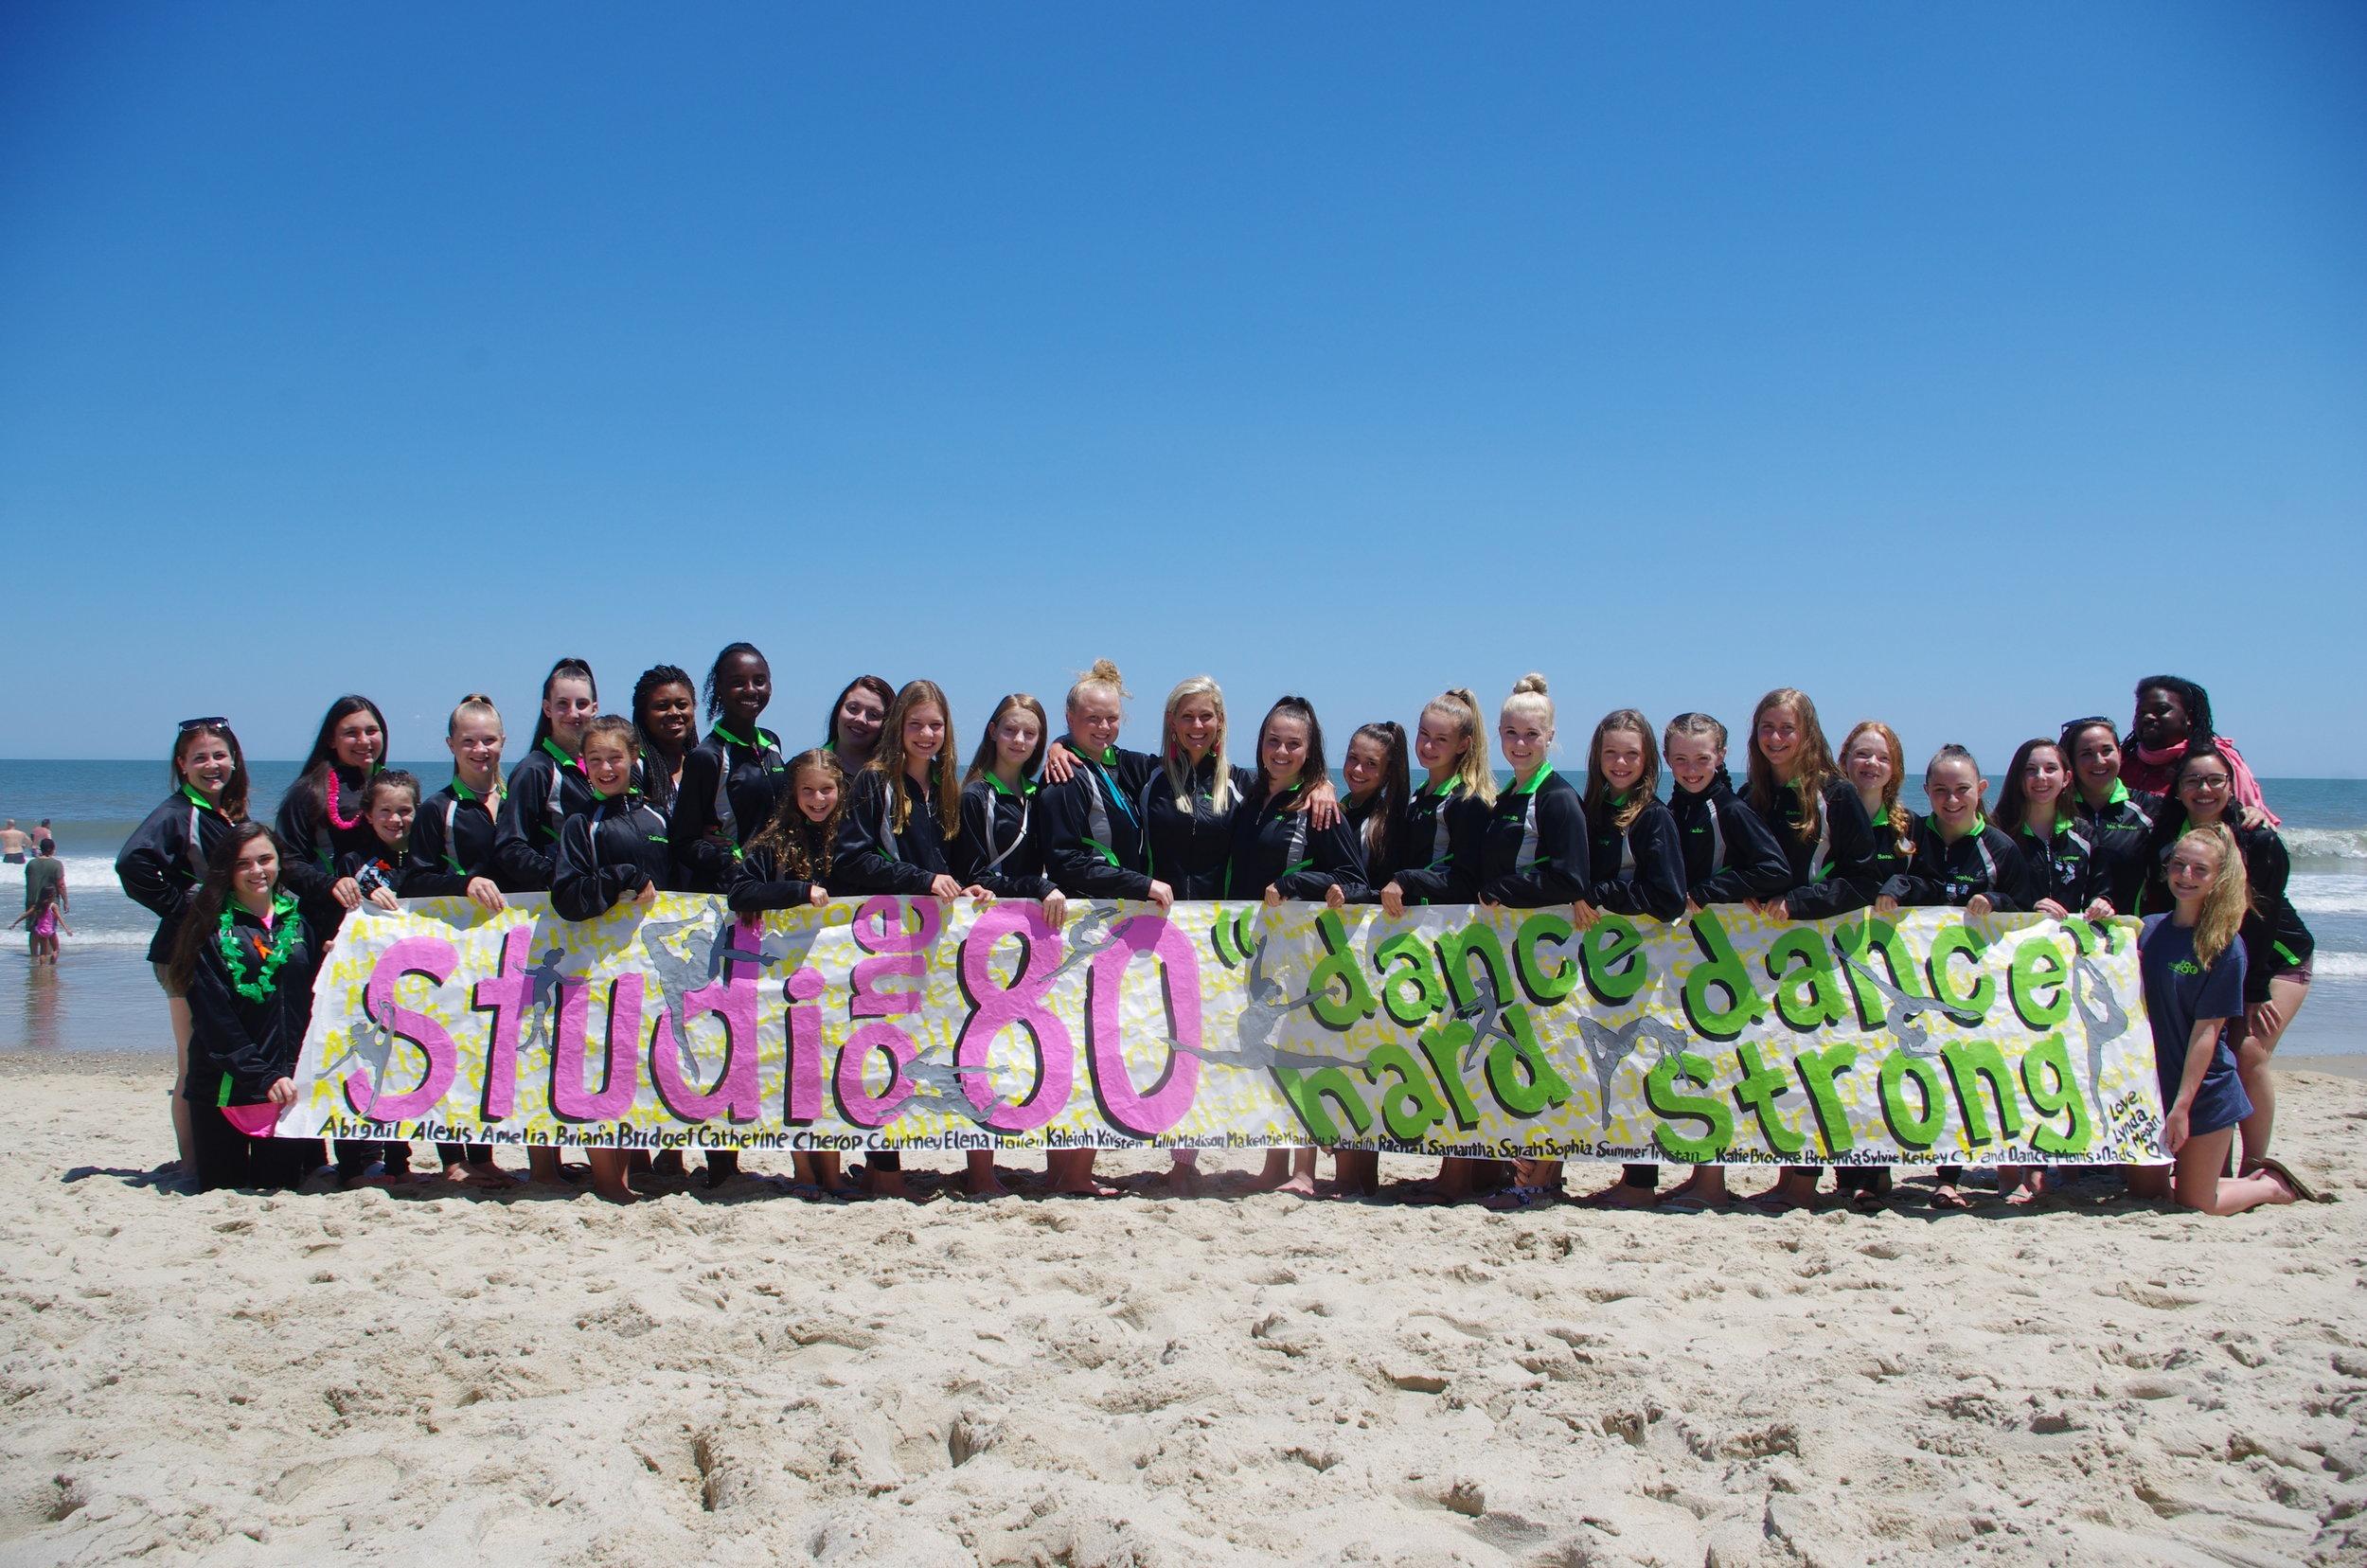 2018 Nationals Team Beach Picture.JPG